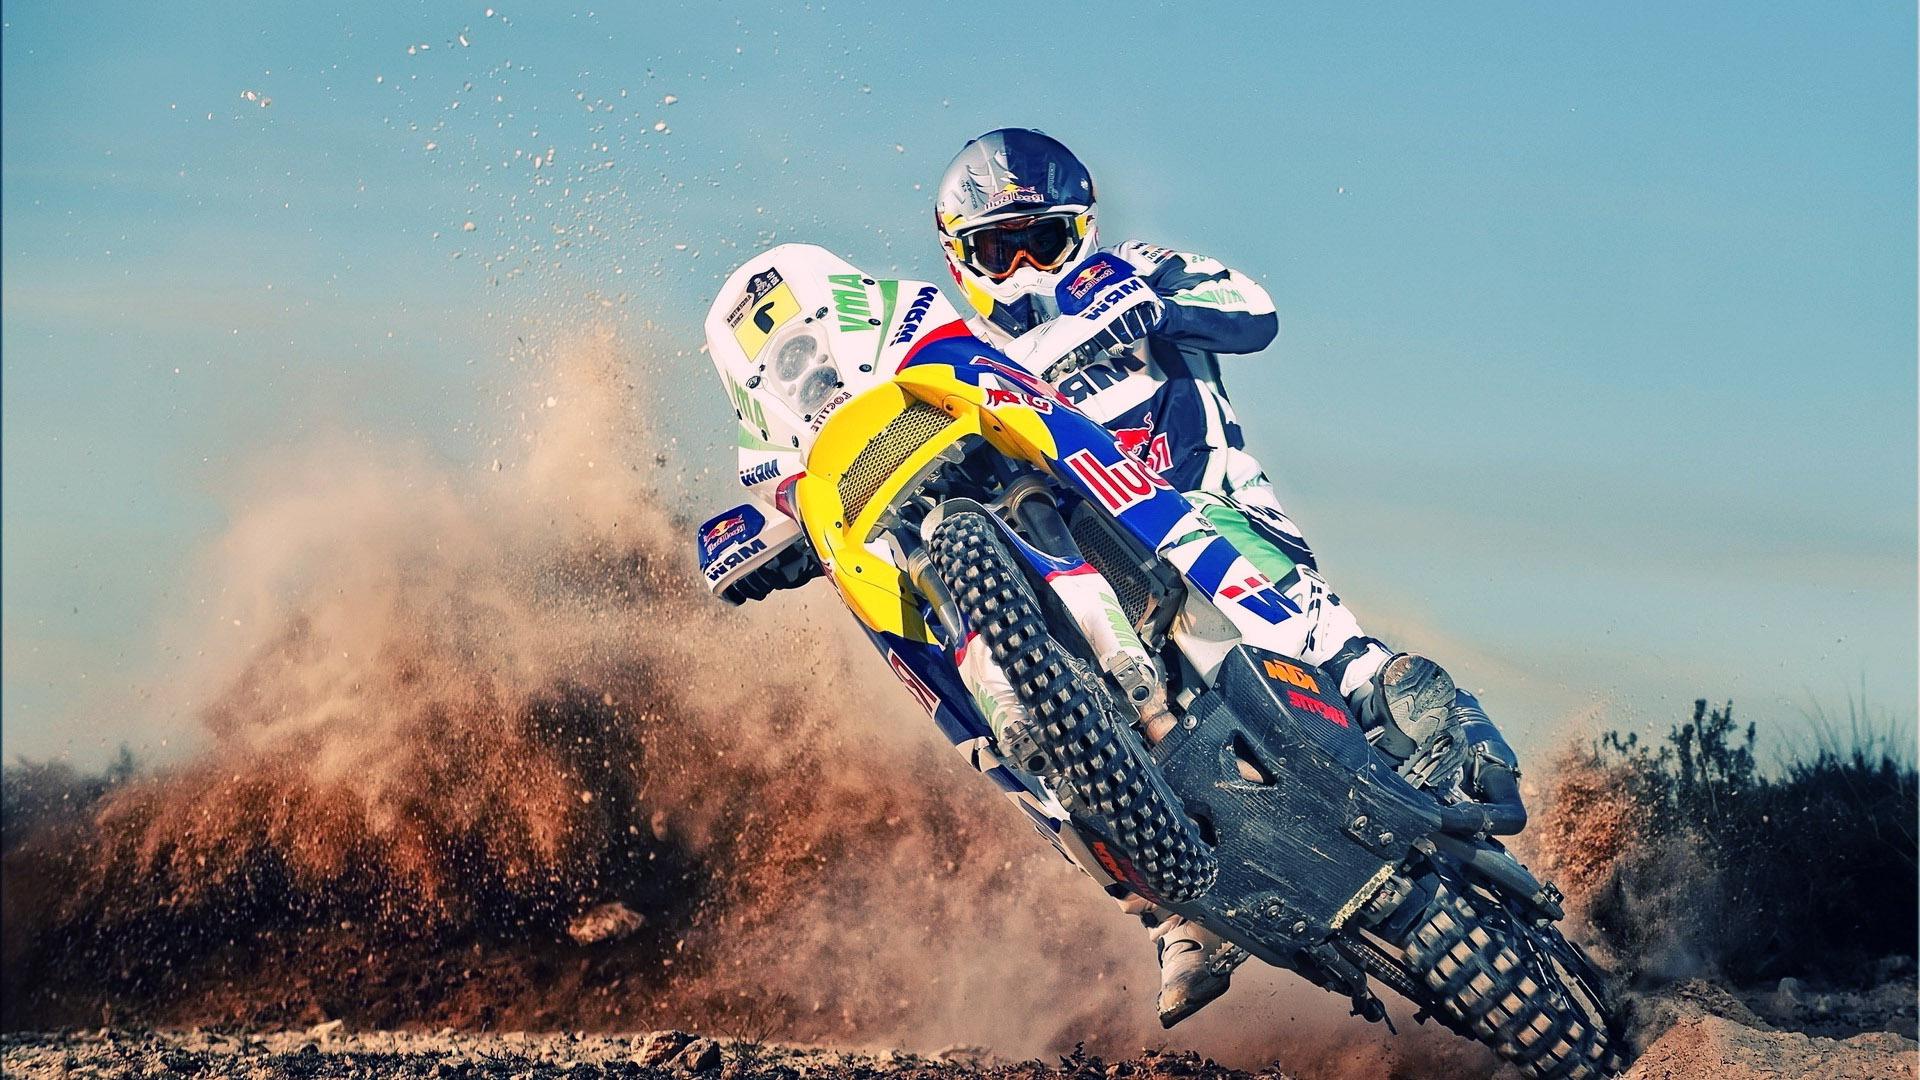 Bike Stunt Hd Wallpaper For Mobile Dirt Bike Wallpaper Hd Pixelstalk Net